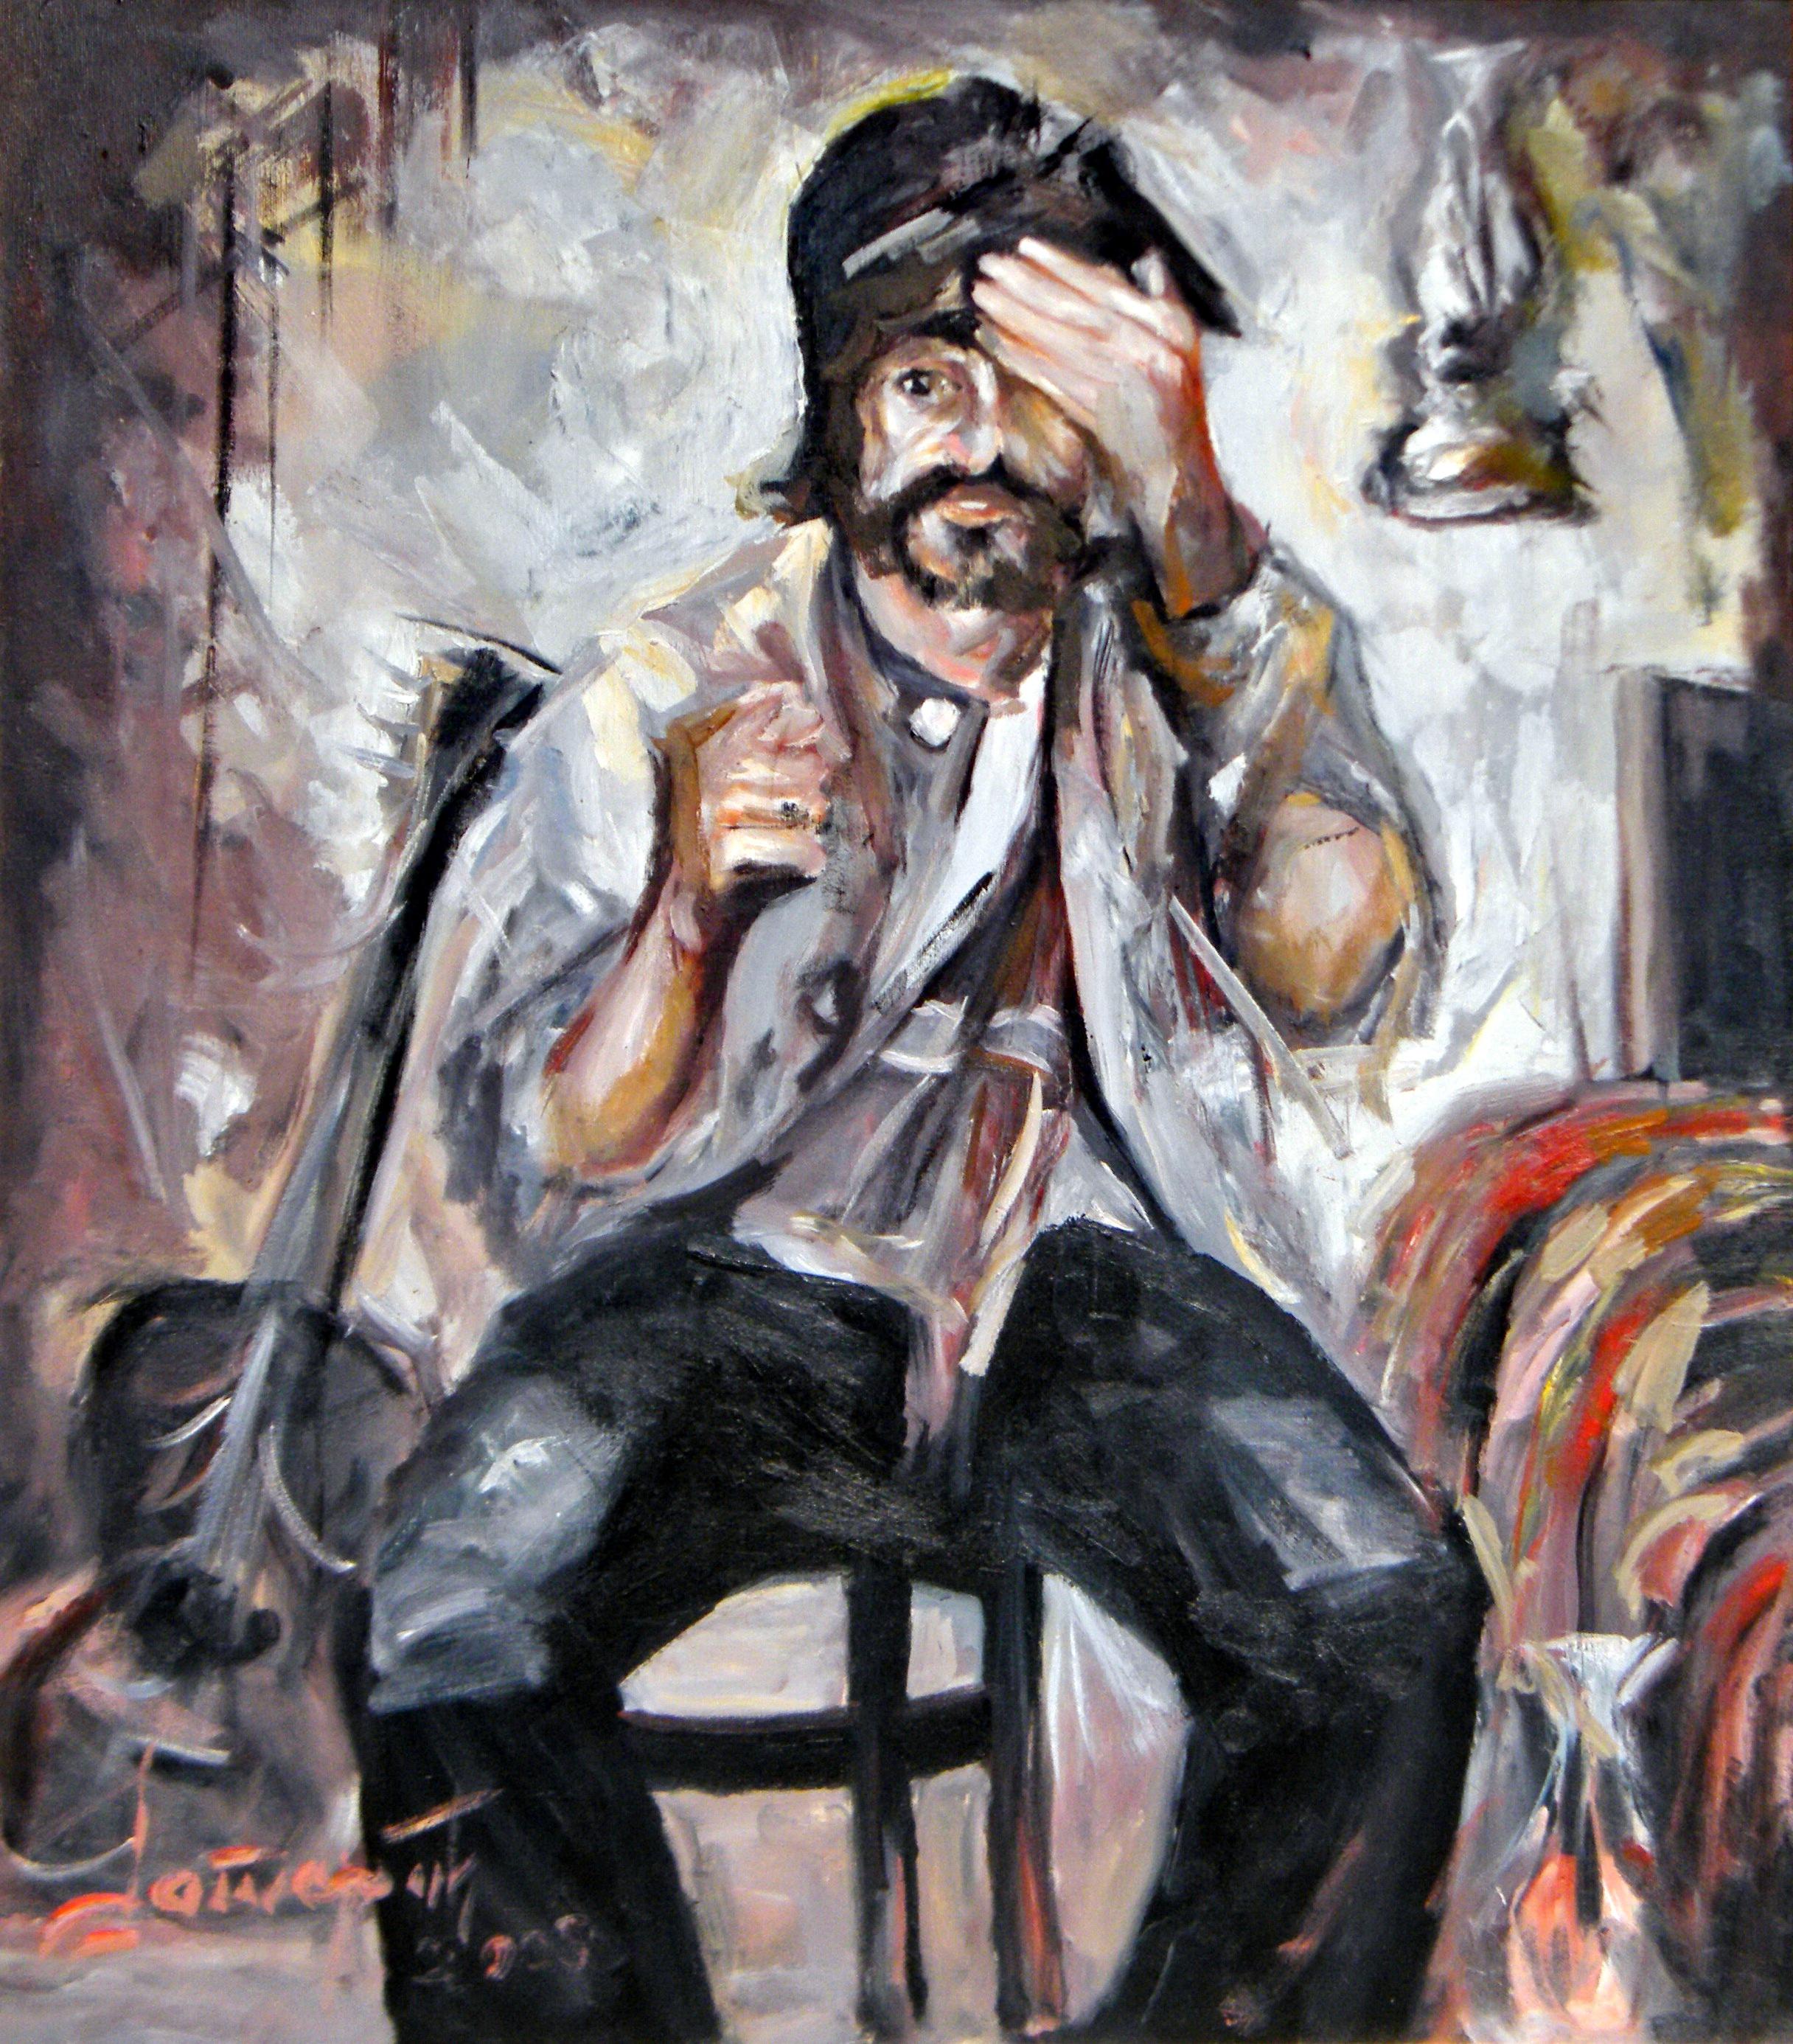 Dikan, Goran Gatarić, oil on canvas